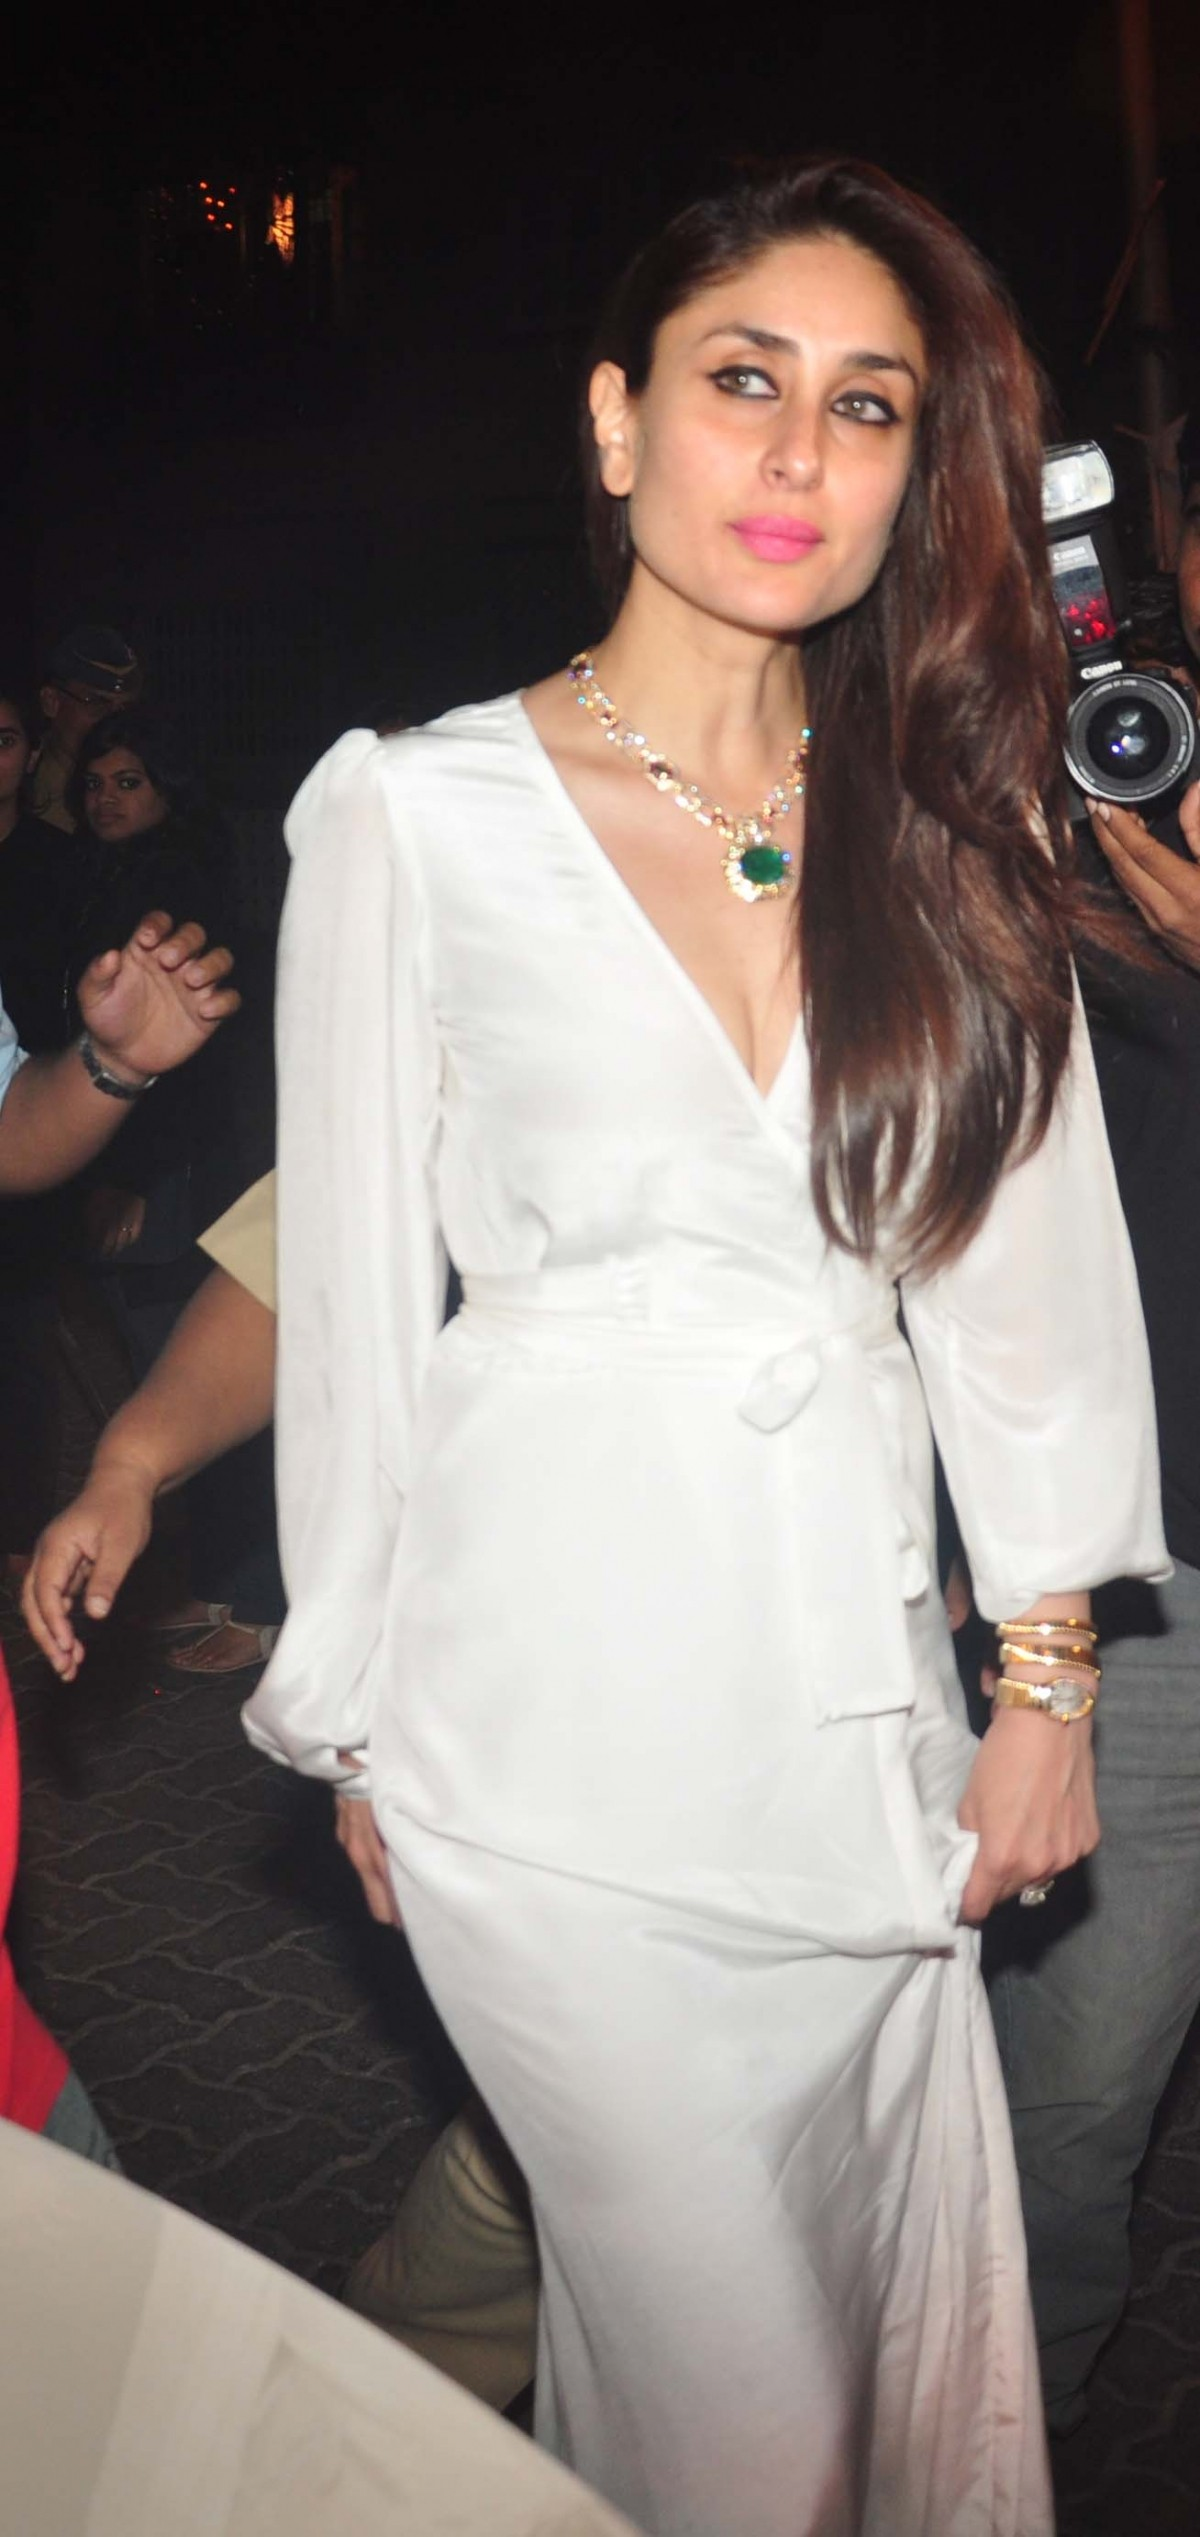 Kareena Kapoor Khan, Genelia D'Souza, Riteish Deshmukh Attends Christmas Midnight Mass